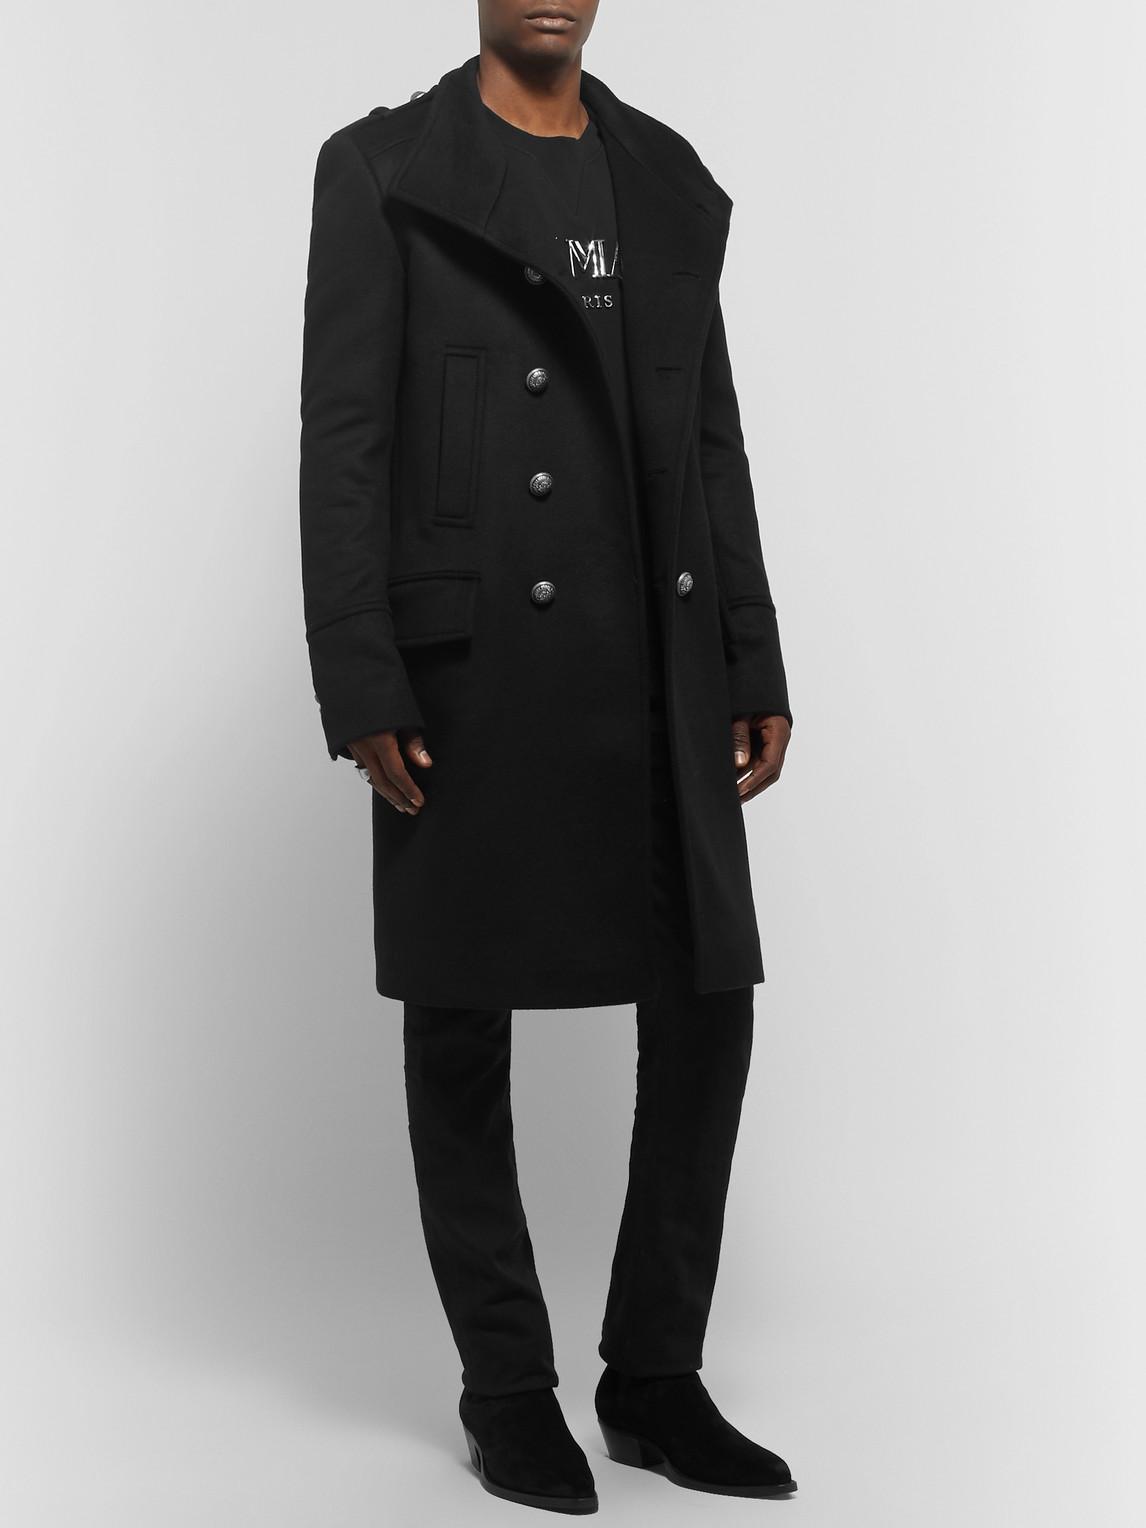 Balmain Coats SLIM-FIT DOUBLE-BREASTED CASHMERE COAT